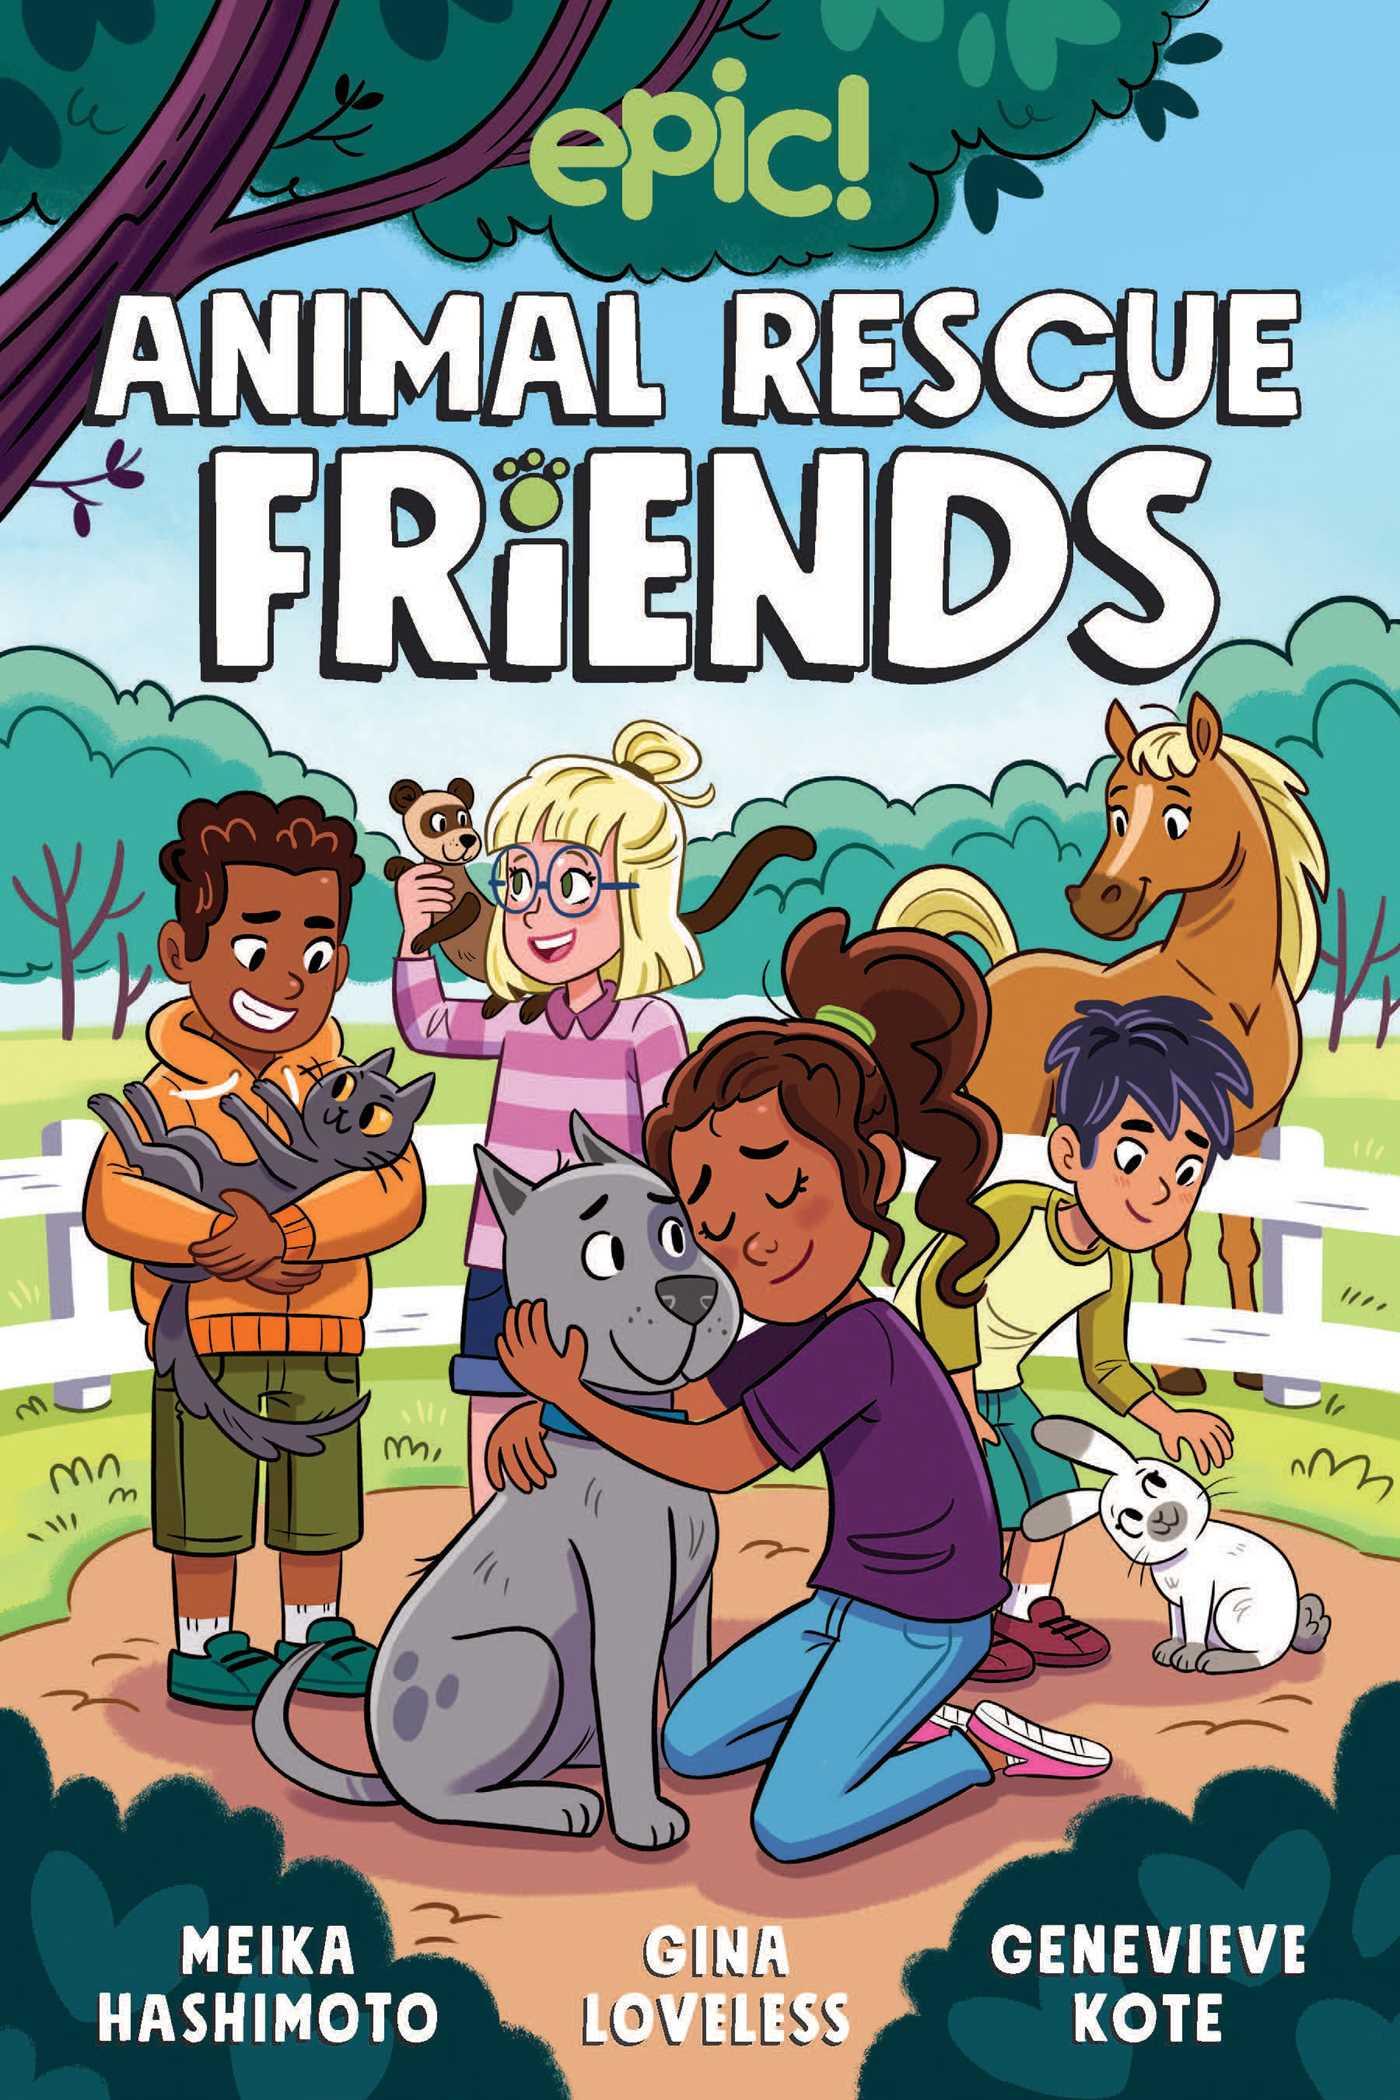 Animal Rescue Friends, Gina Loveless, Meika Hashimoto, Genevieve Kote, Boys, Girls, Pets, Animals, Graphic Novel, Children's Books, Rescue Centre